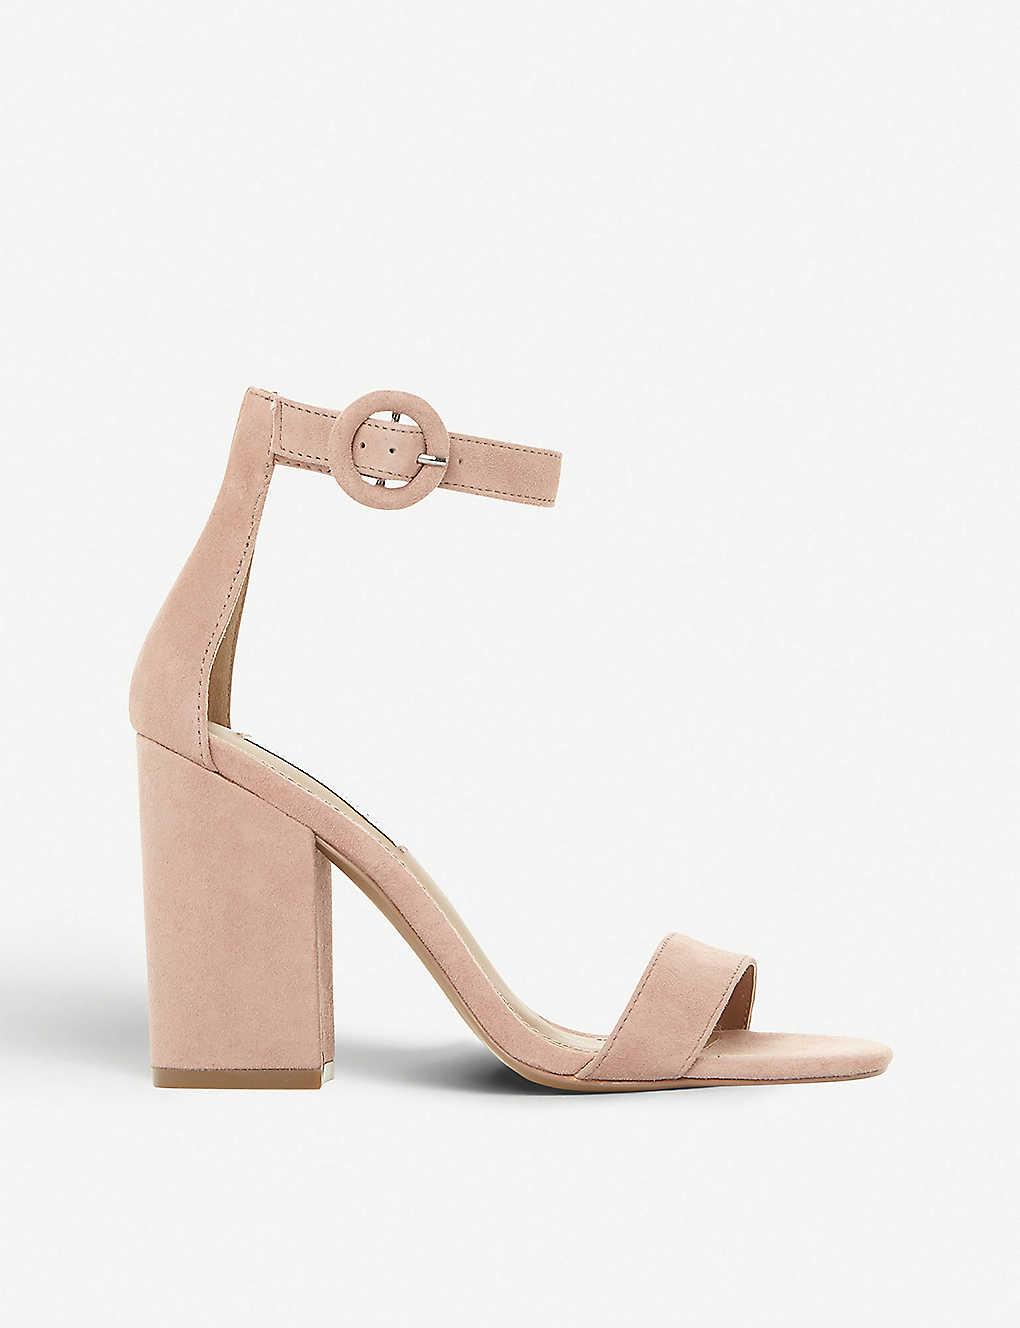 c1c2cc2c3d STEVE MADDEN - Friday block heel suede sandals | Selfridges.comm